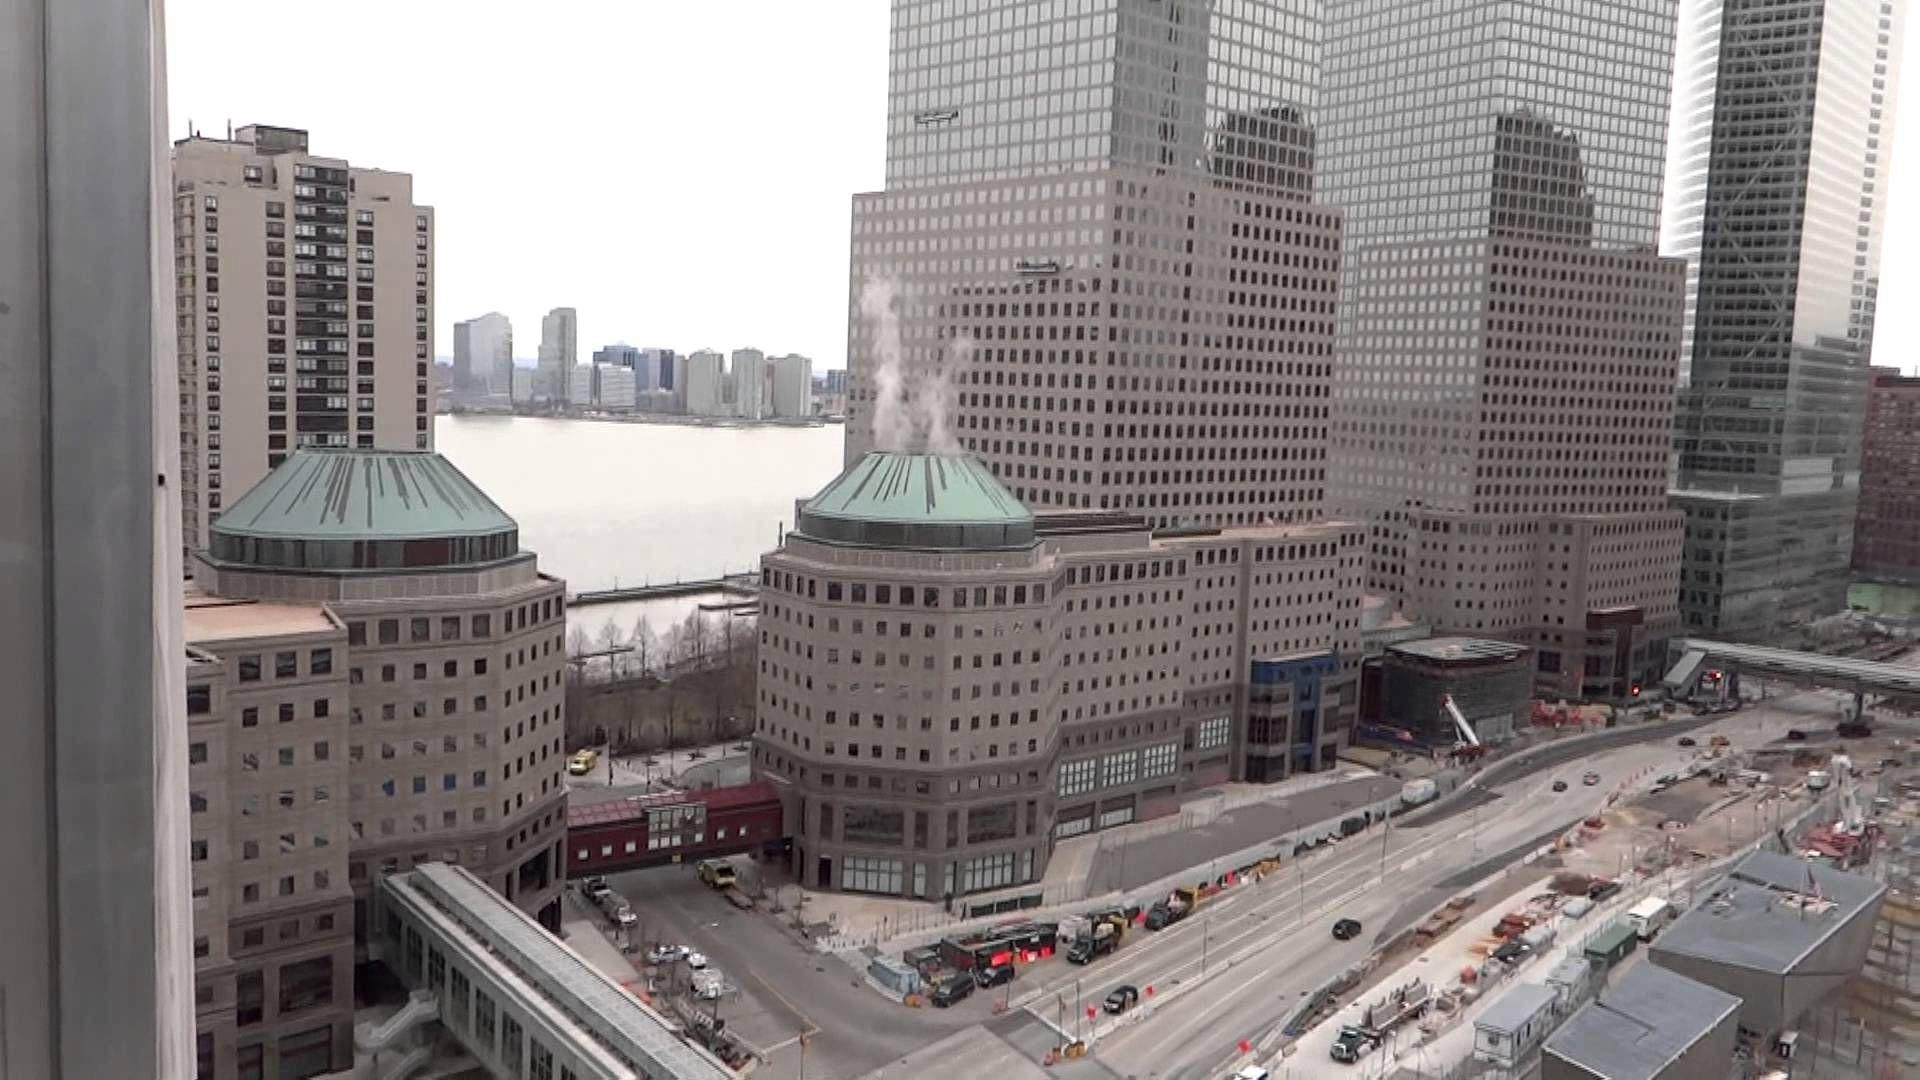 Ground Zero New York 911 Memorial